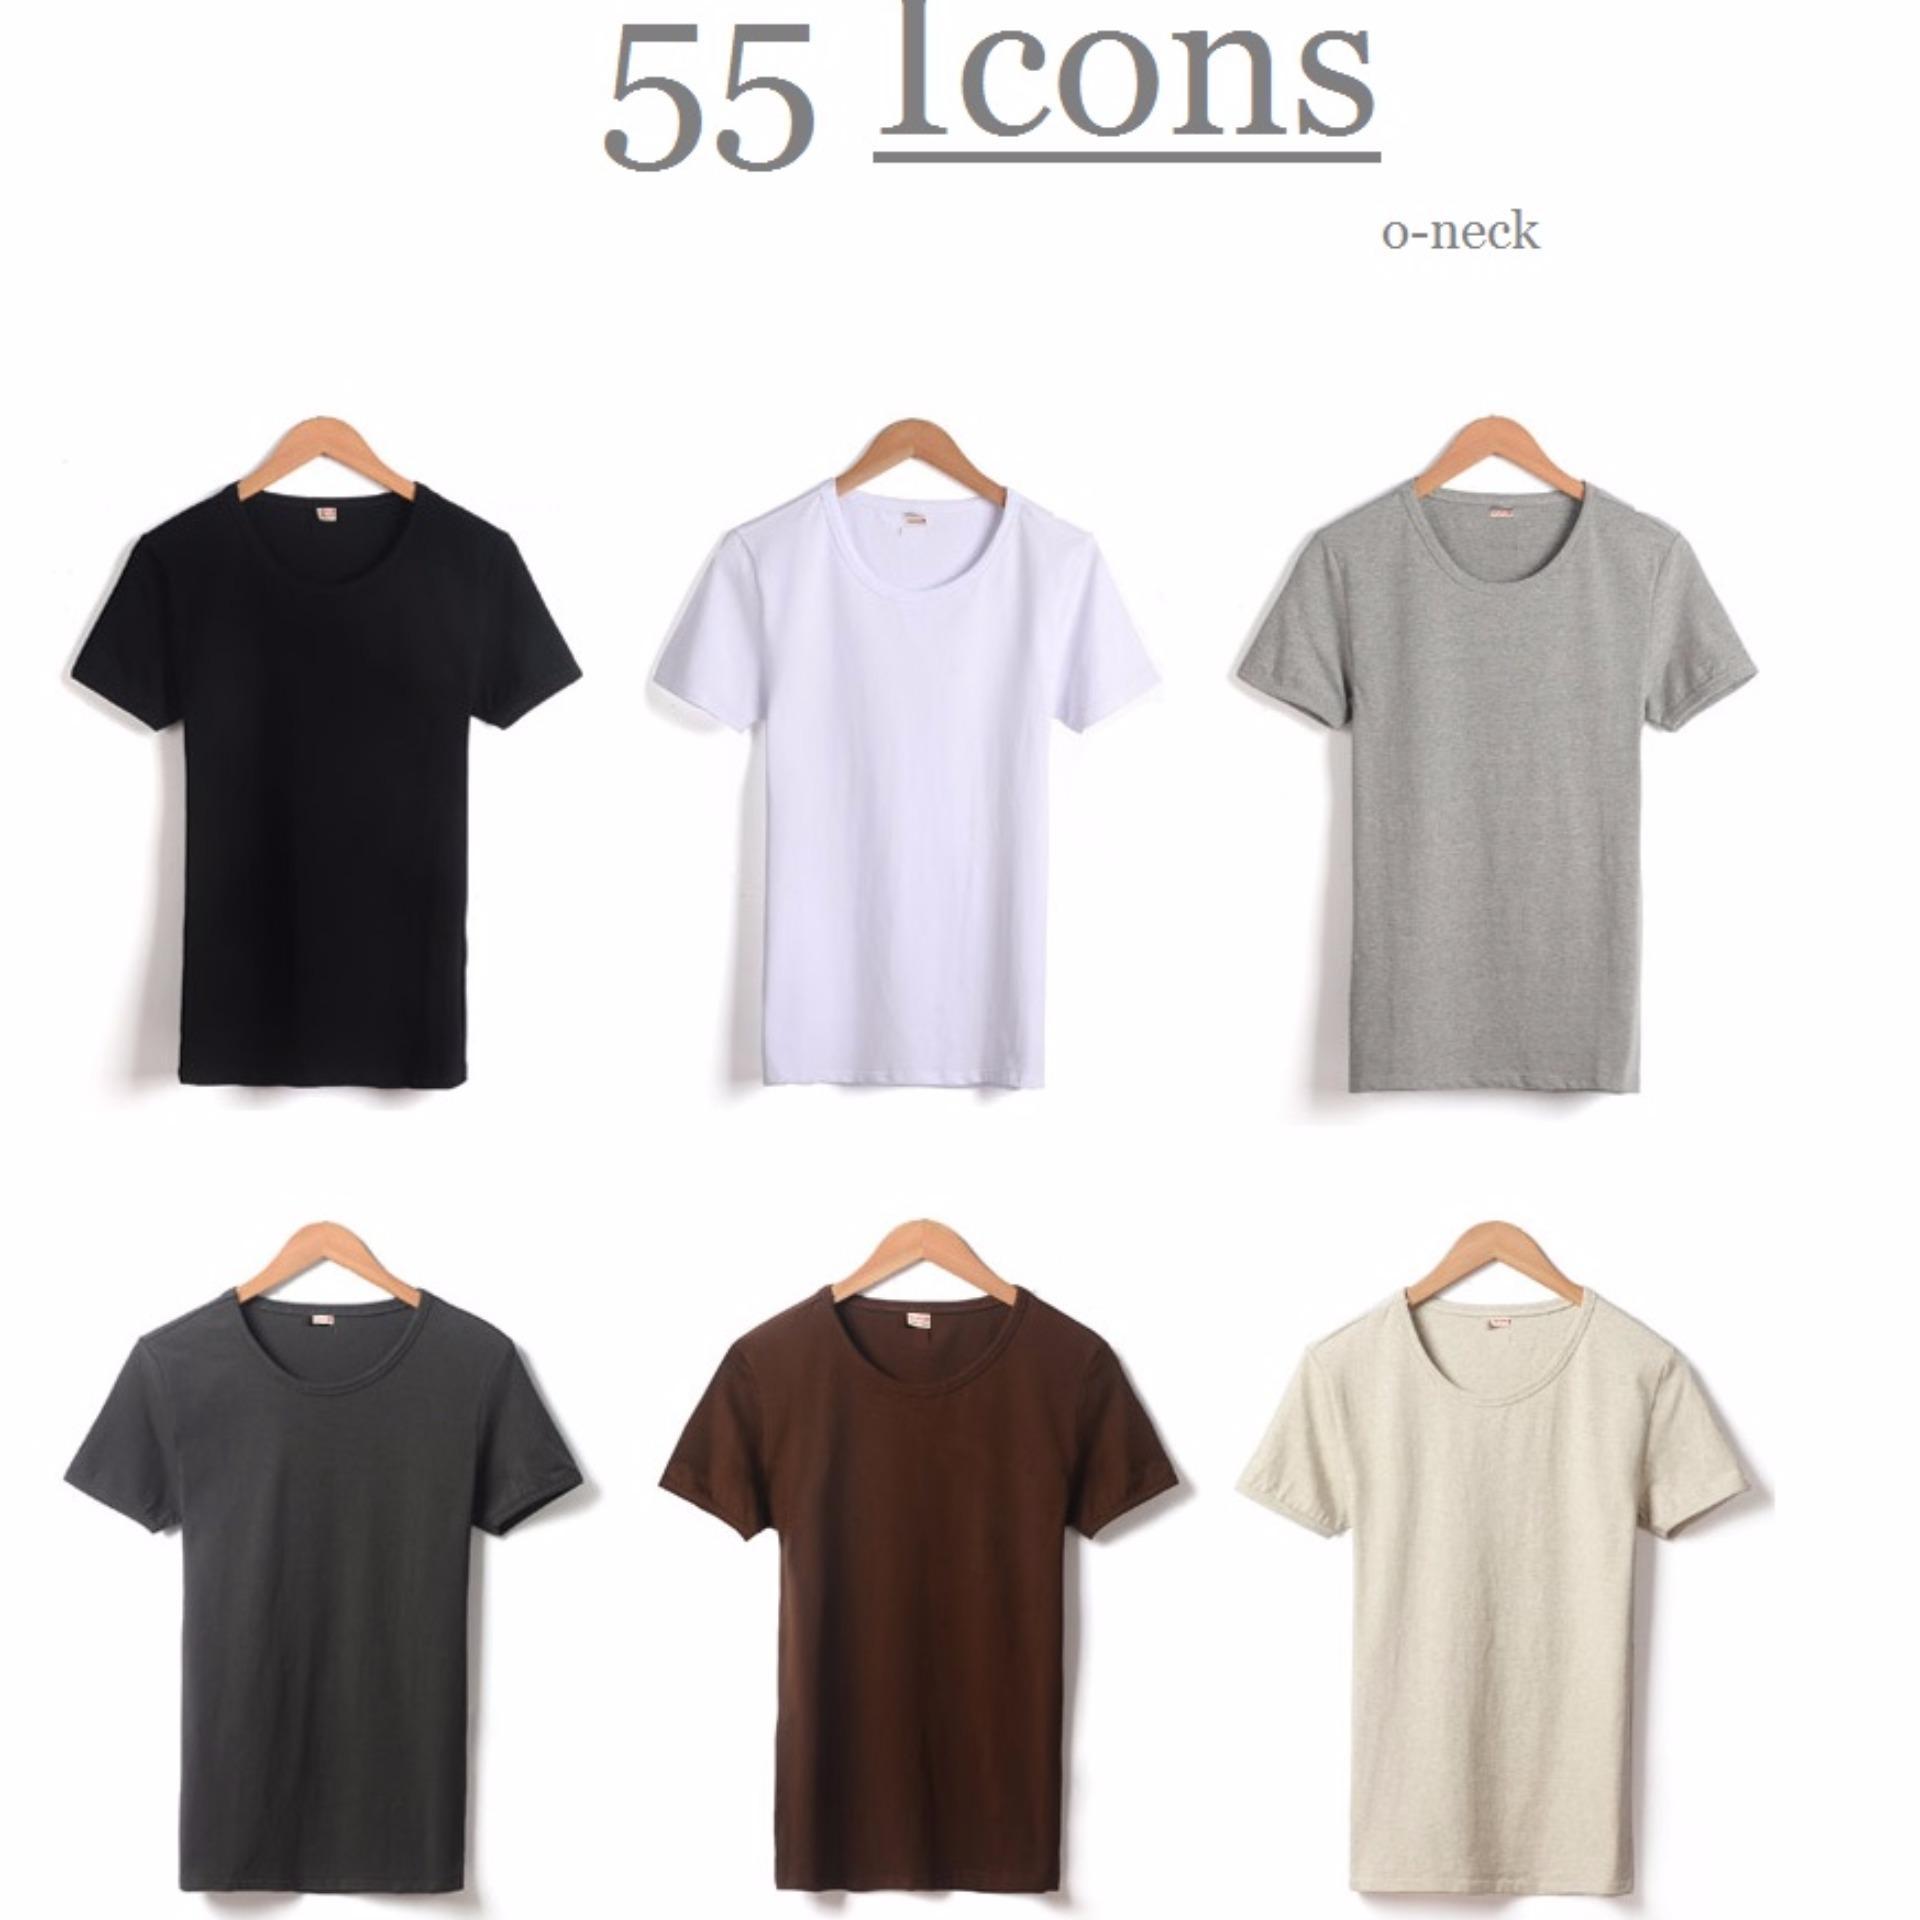 ... Kaos55 Kaos T-Shirt O-Neck Lengan Pendek - Abu Tua ...